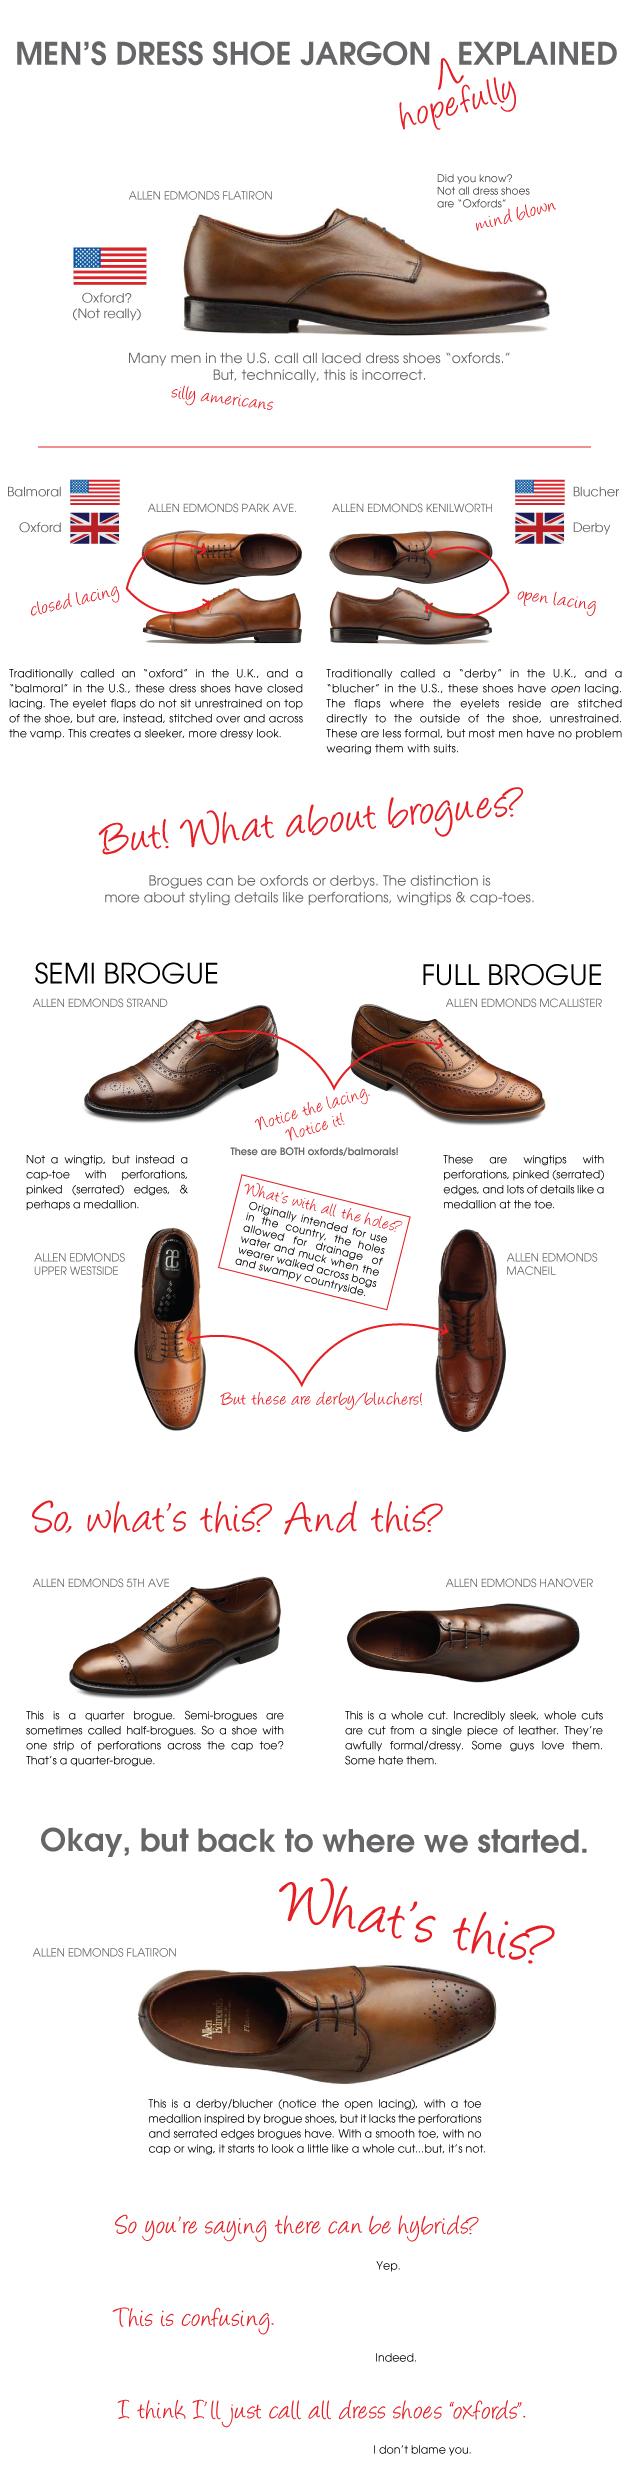 Men's Dress Shoe Jargon (Hopefully) Explained